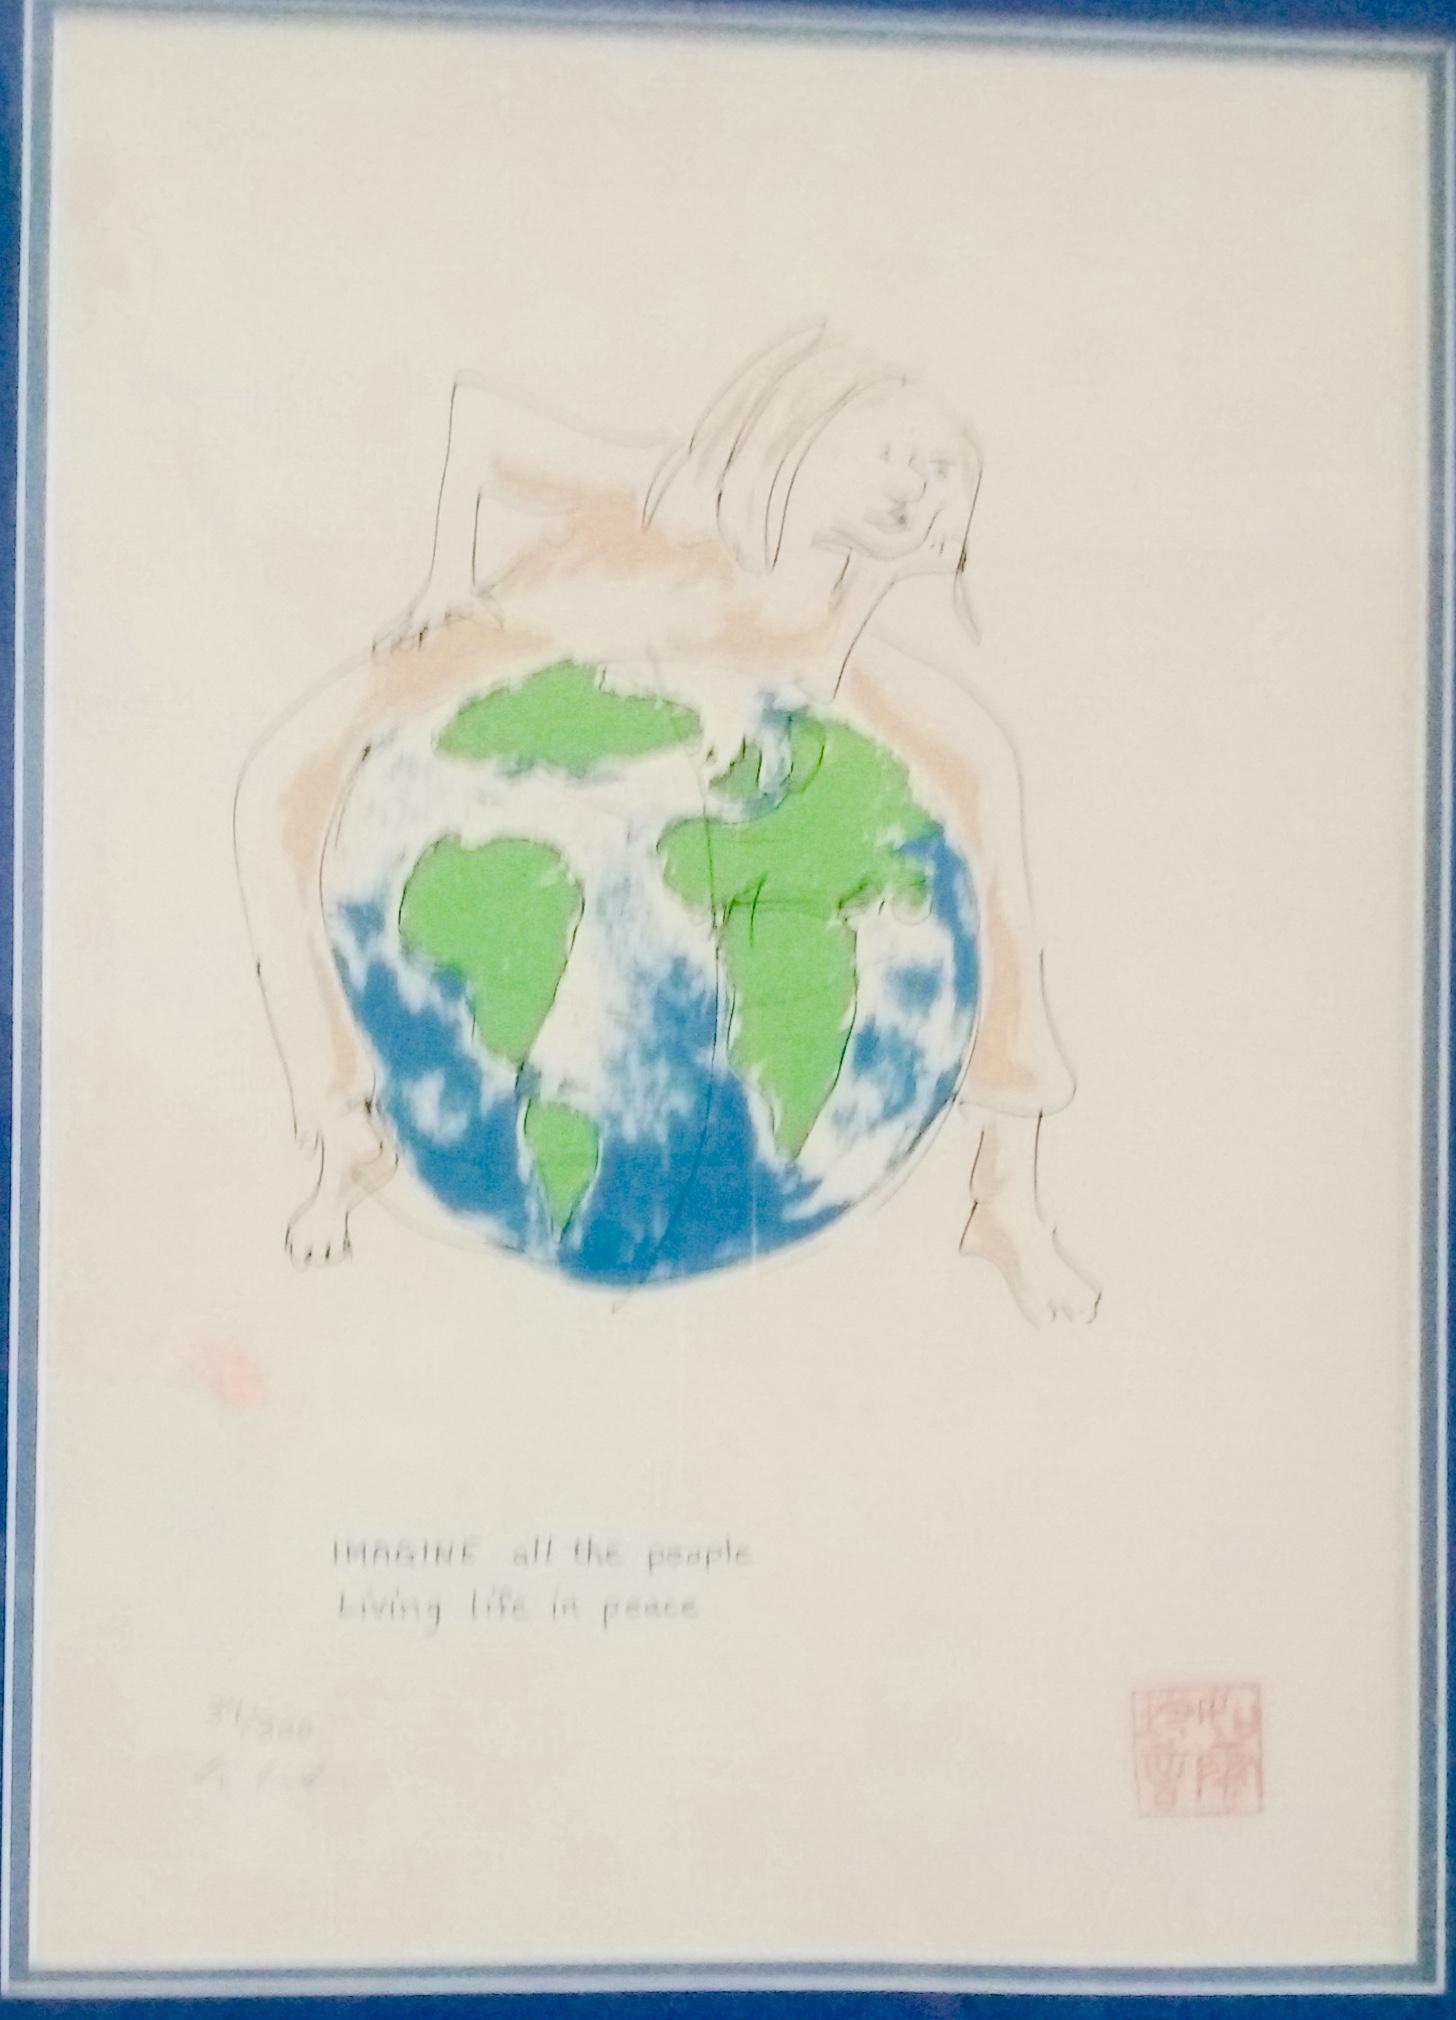 Imagine All The People artwork by John Lennon - art listed for sale on Artplode